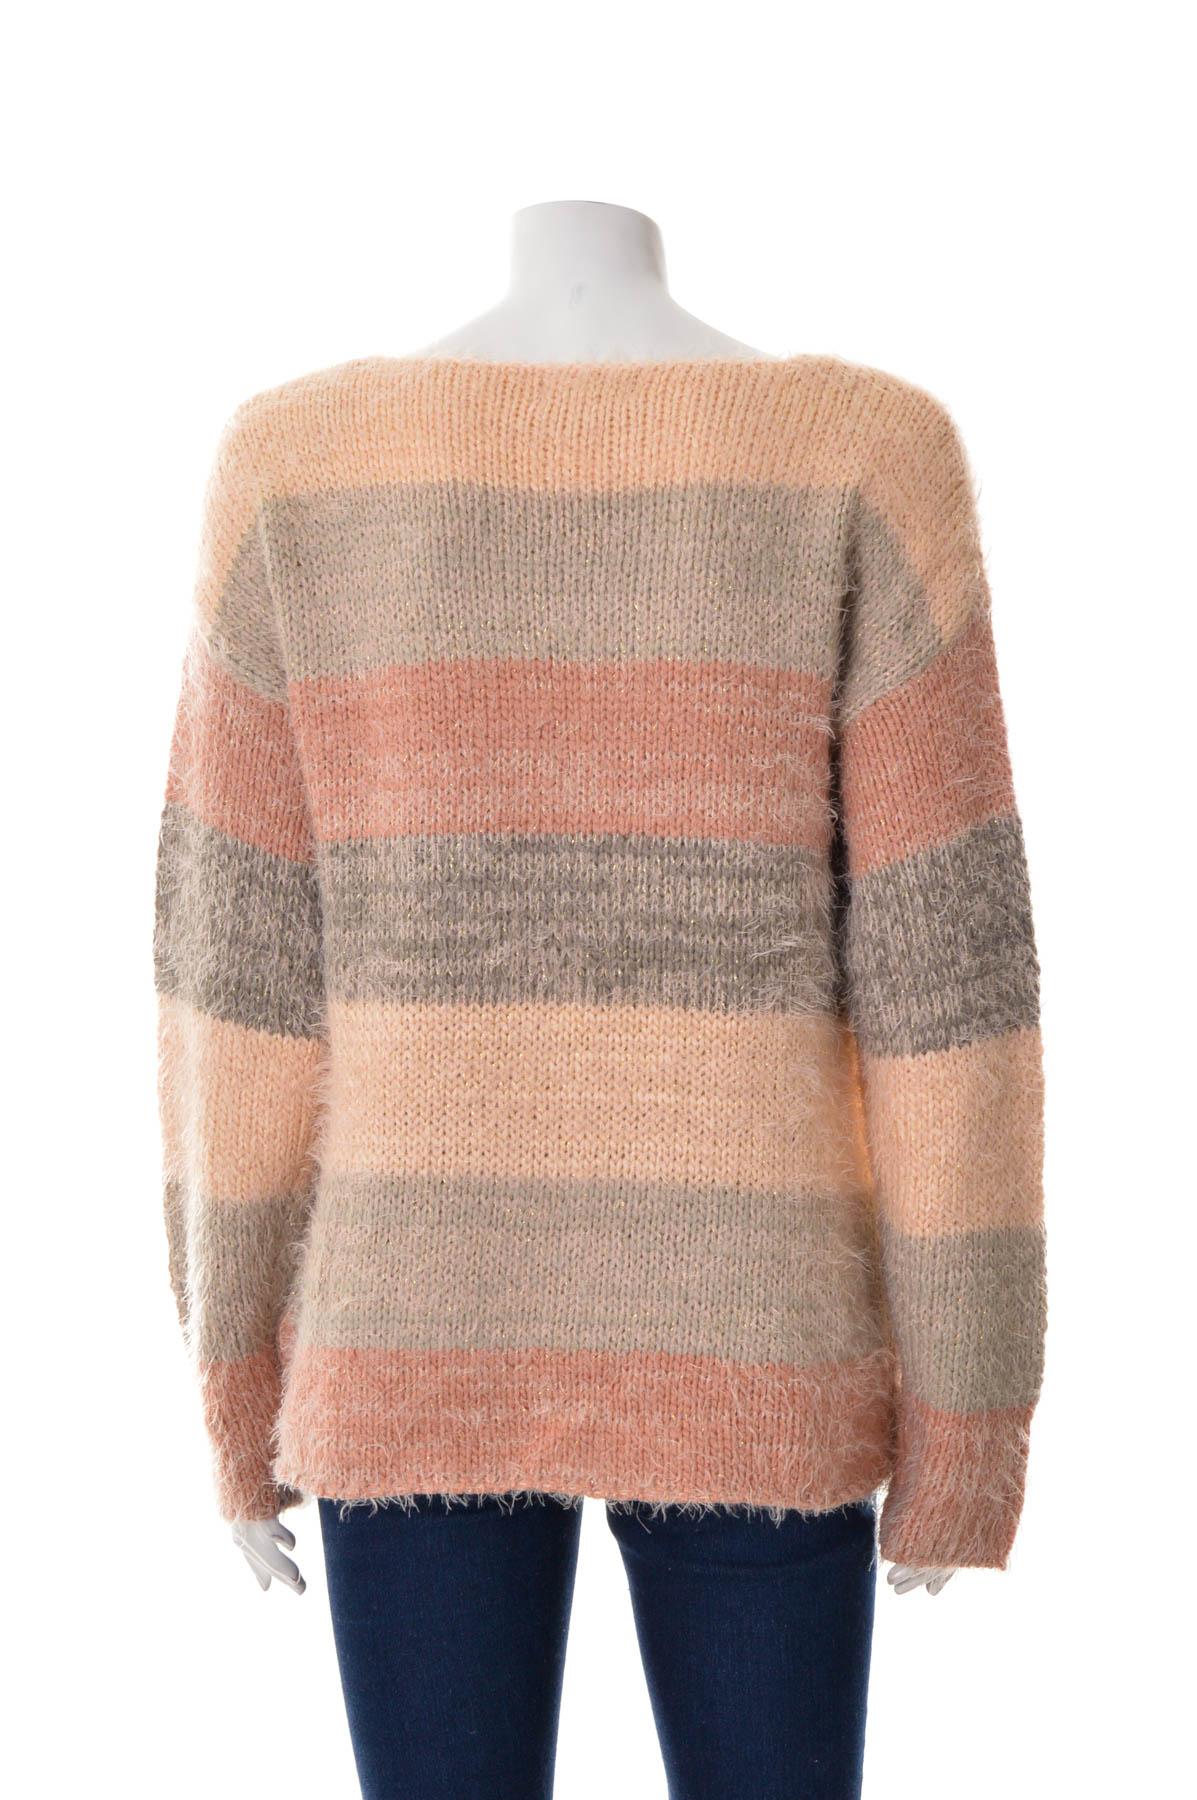 Women's sweater - Cami - 1